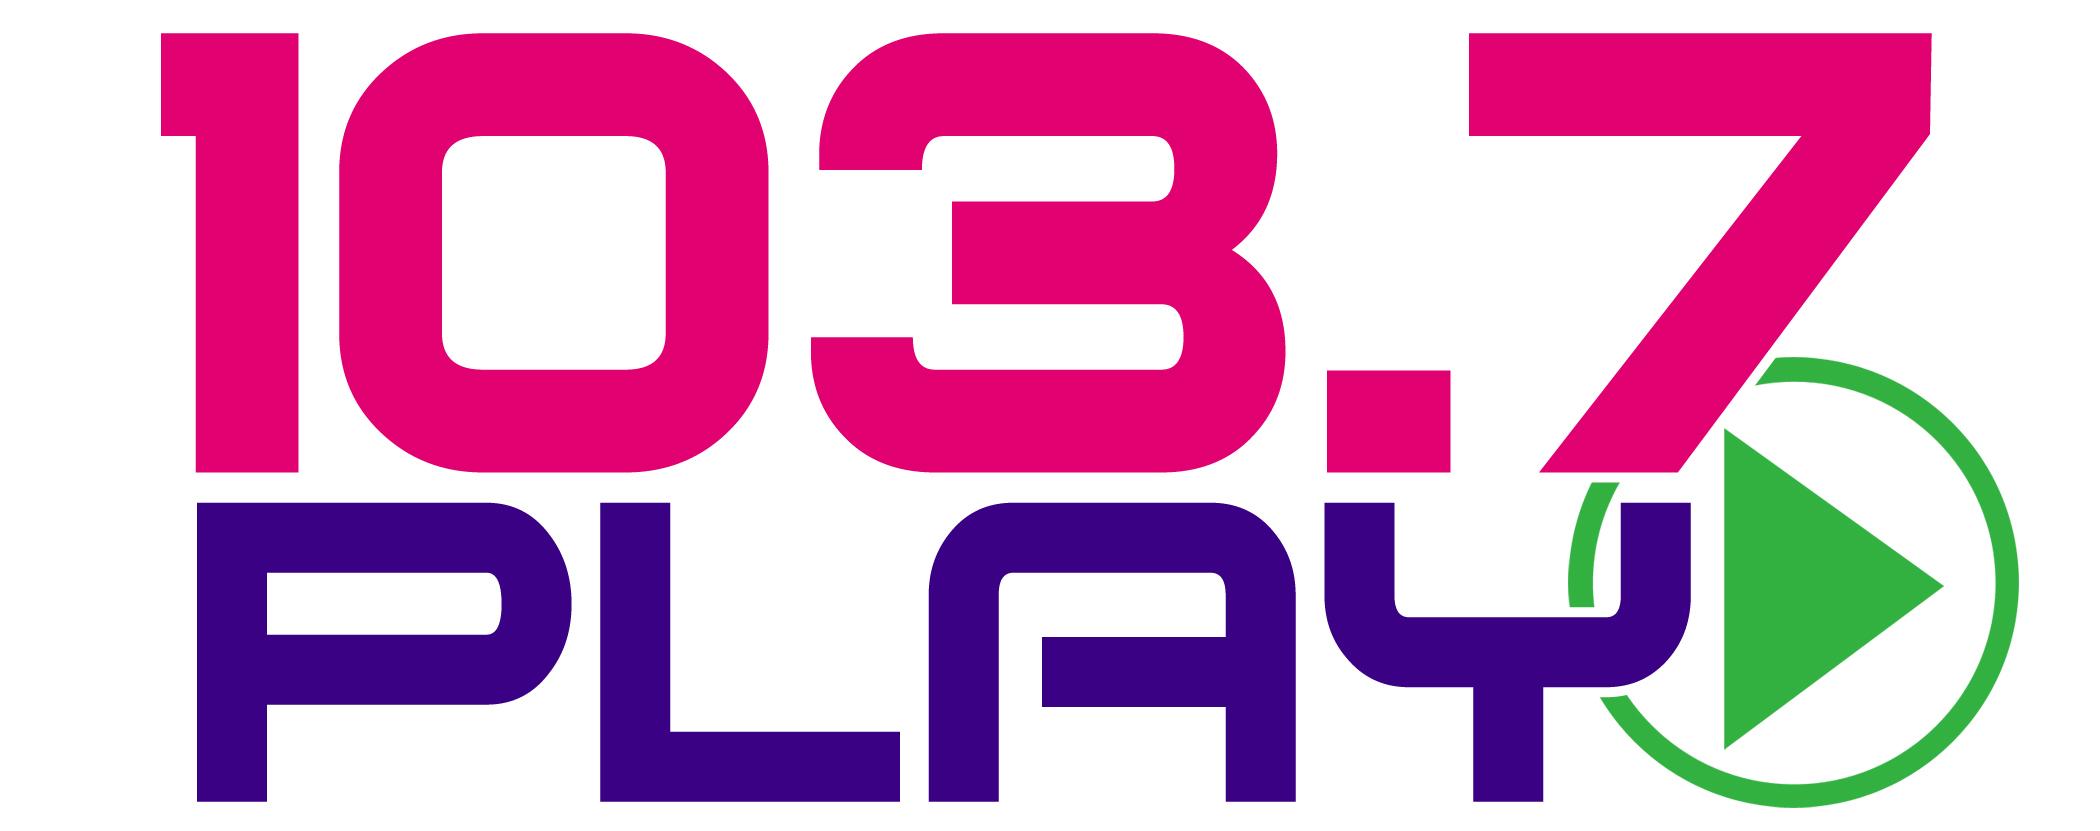 103.7 Play logo